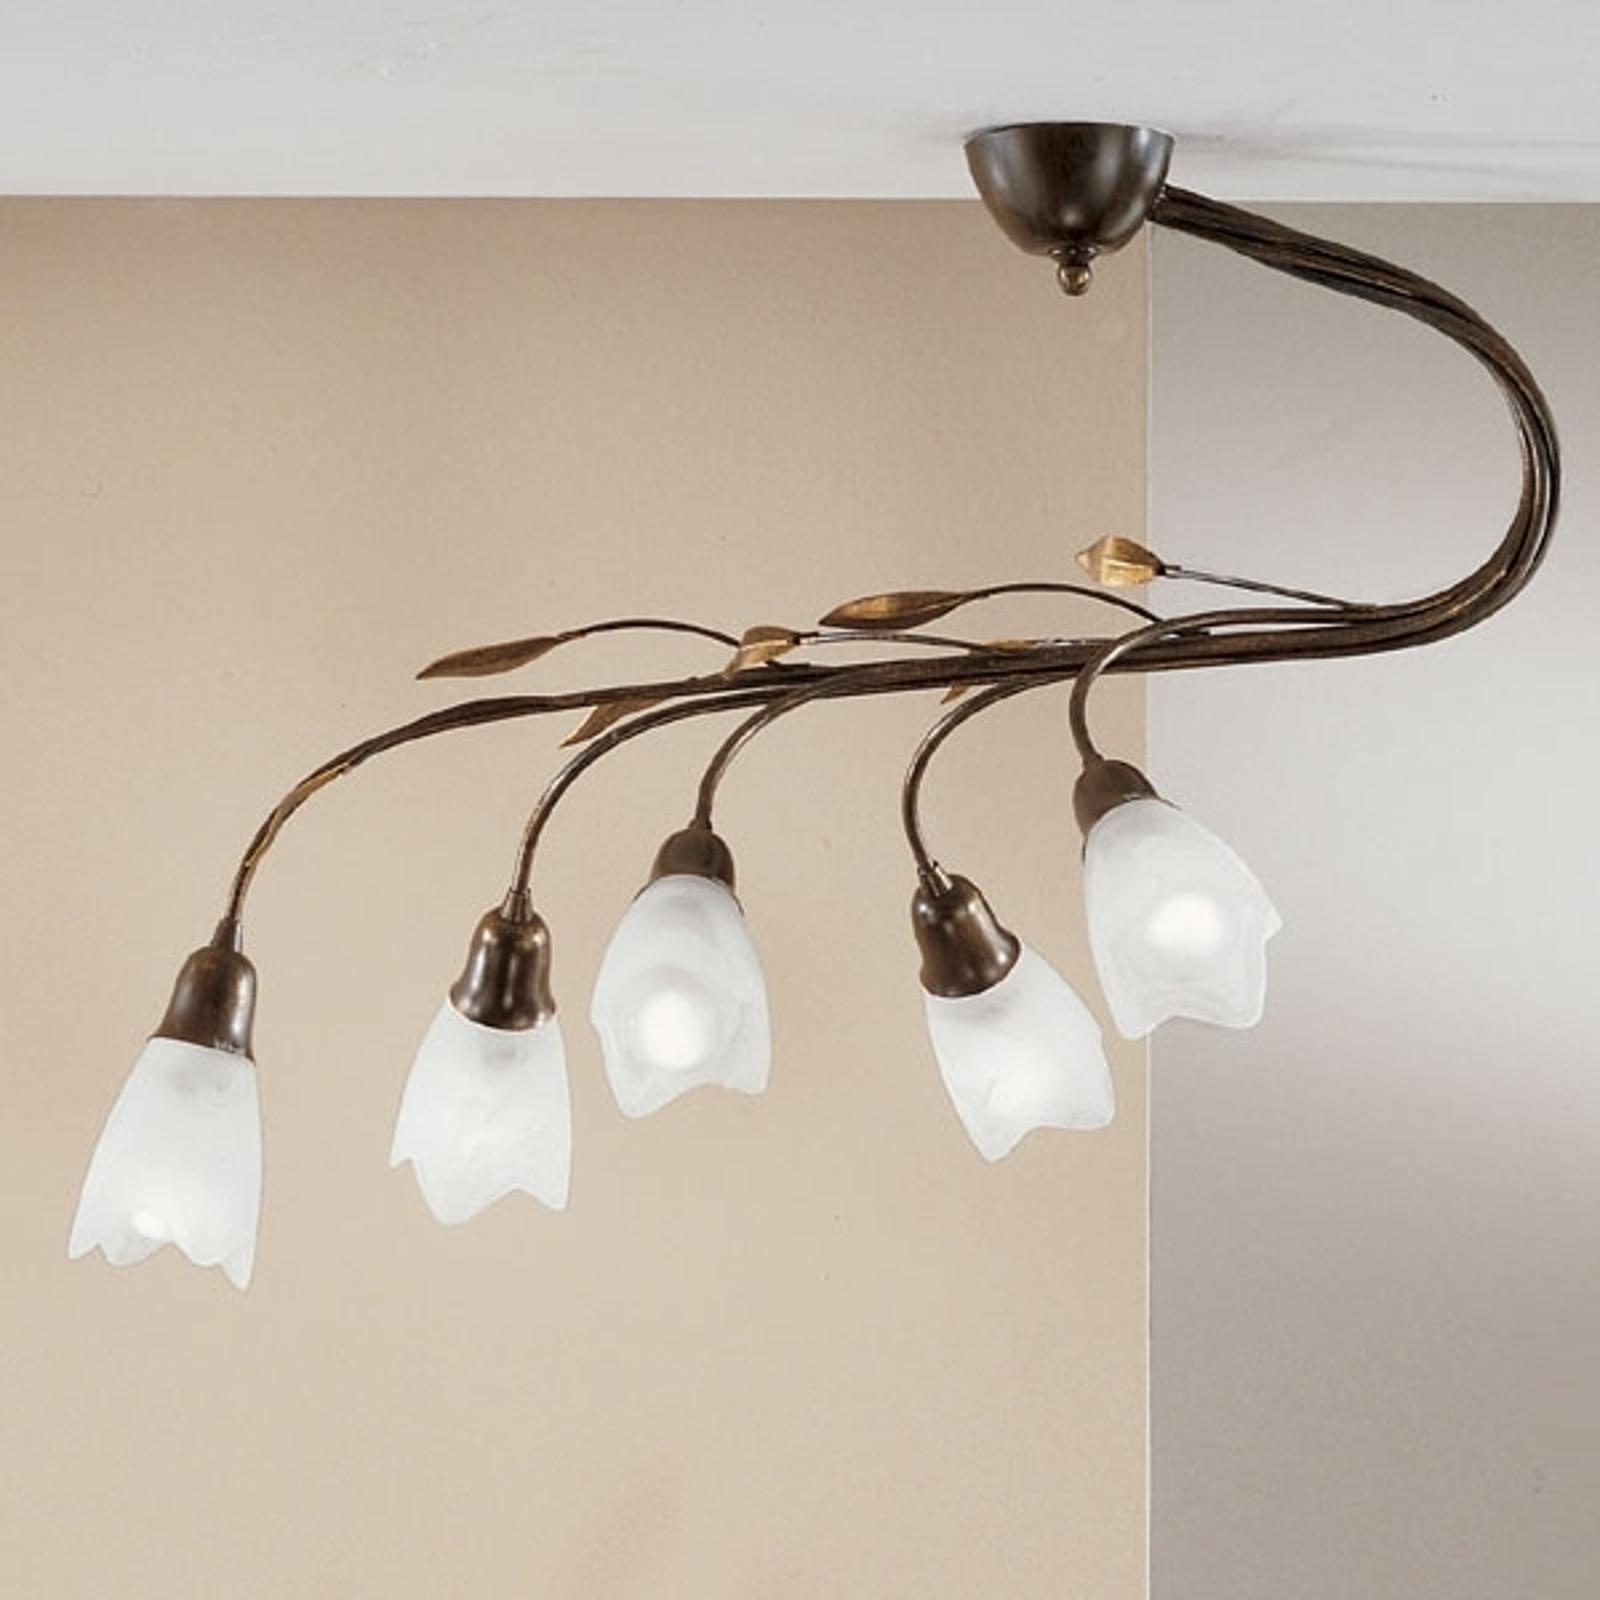 Campana taklampe, 5 lyskilder, rett